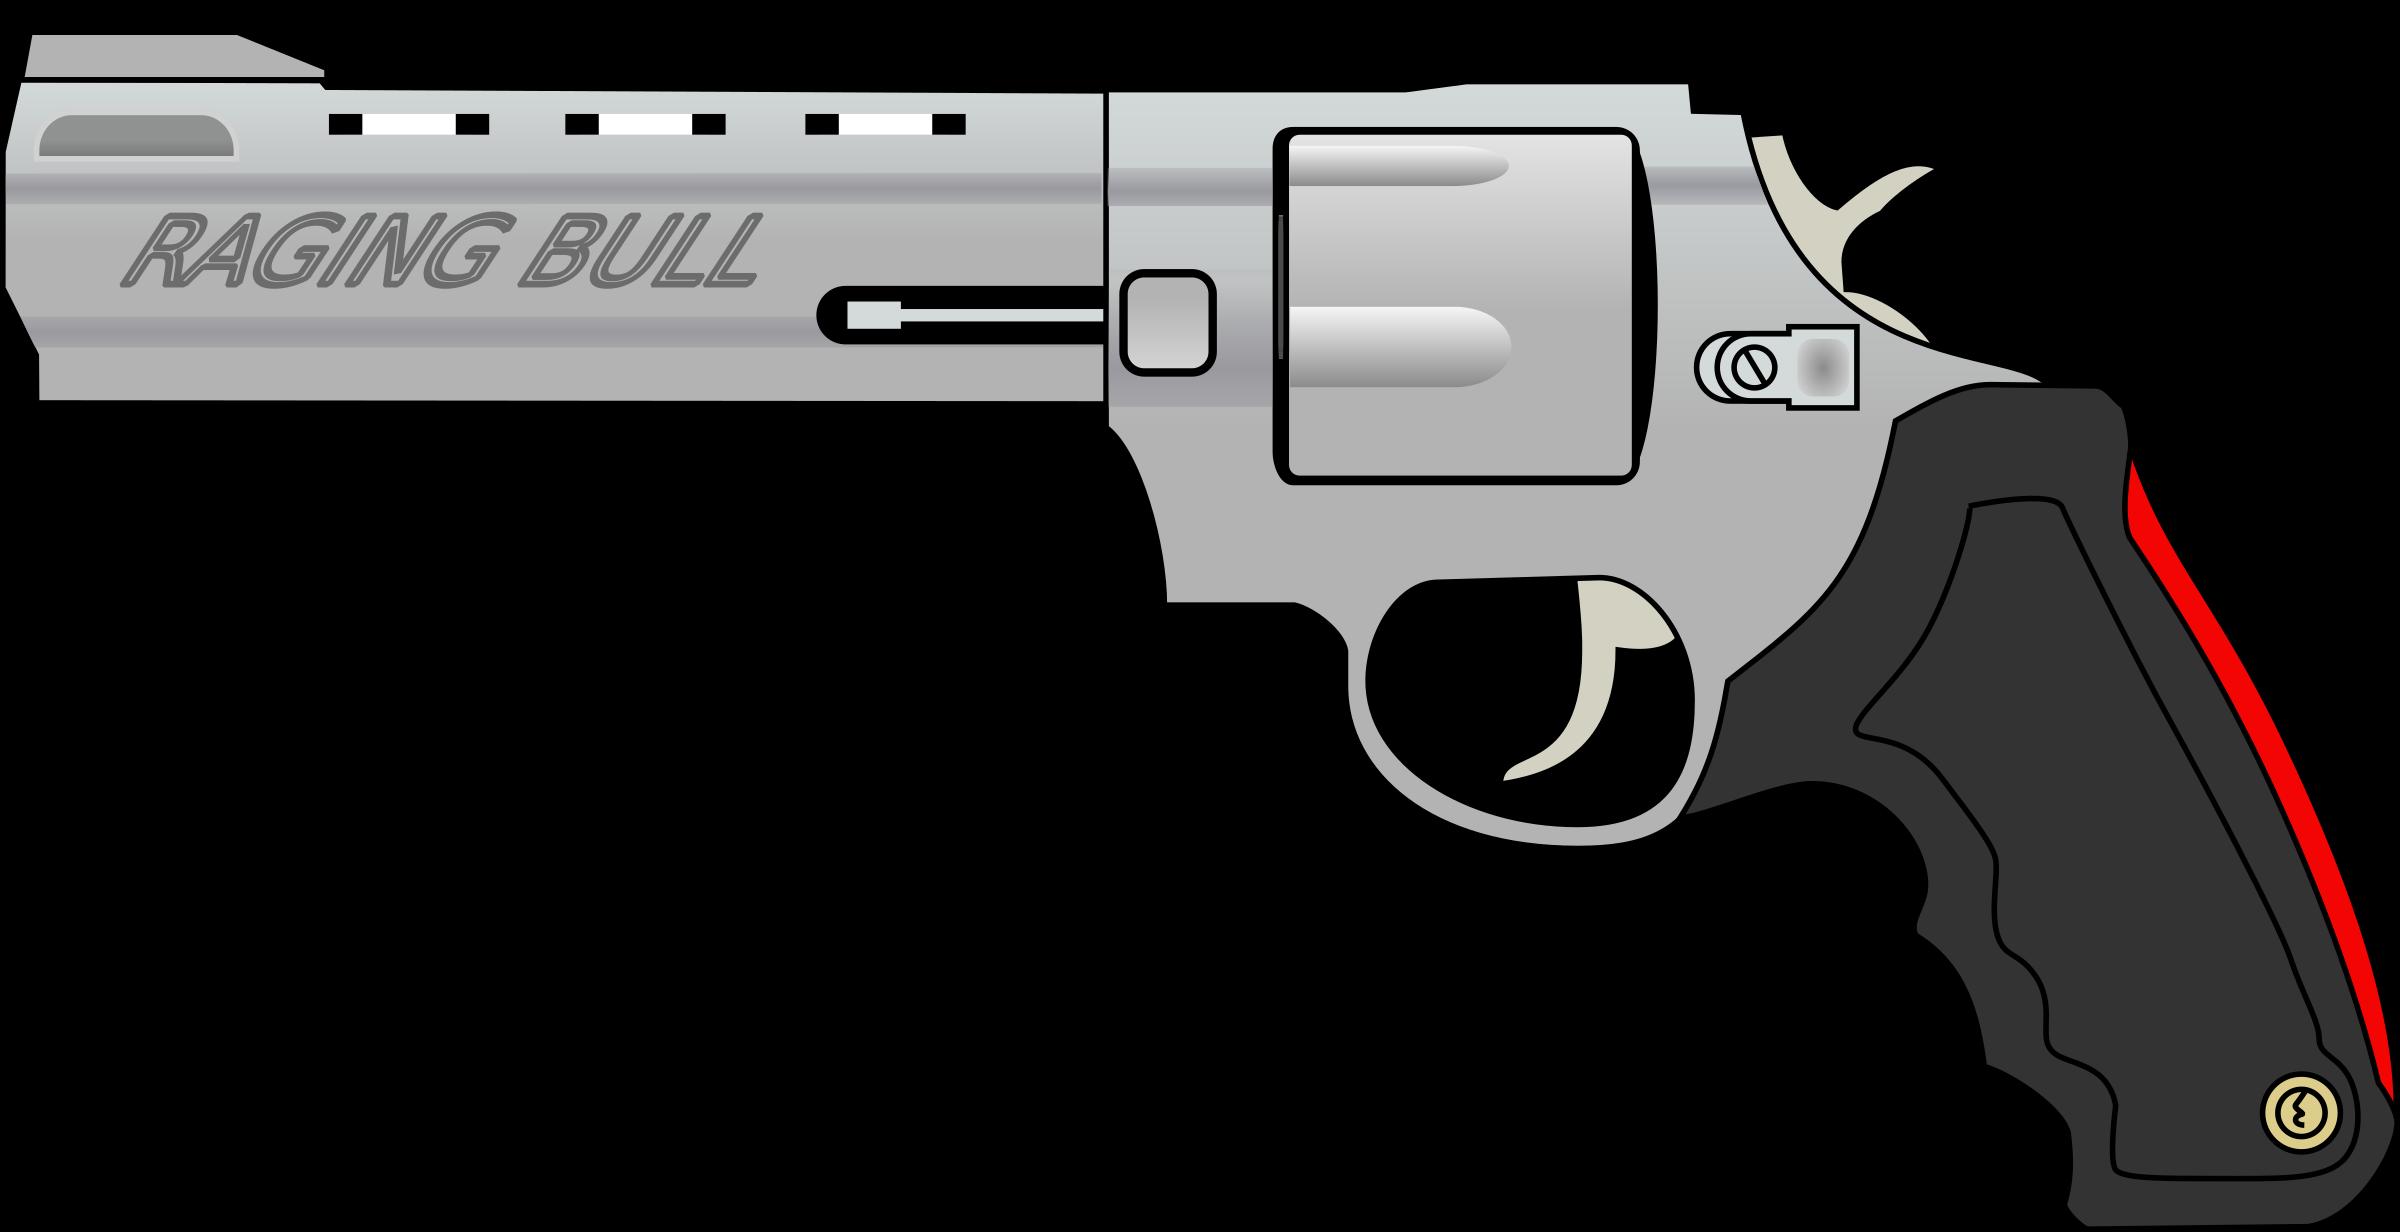 image royalty free stock Raging bull big image. Gun clipart pdf